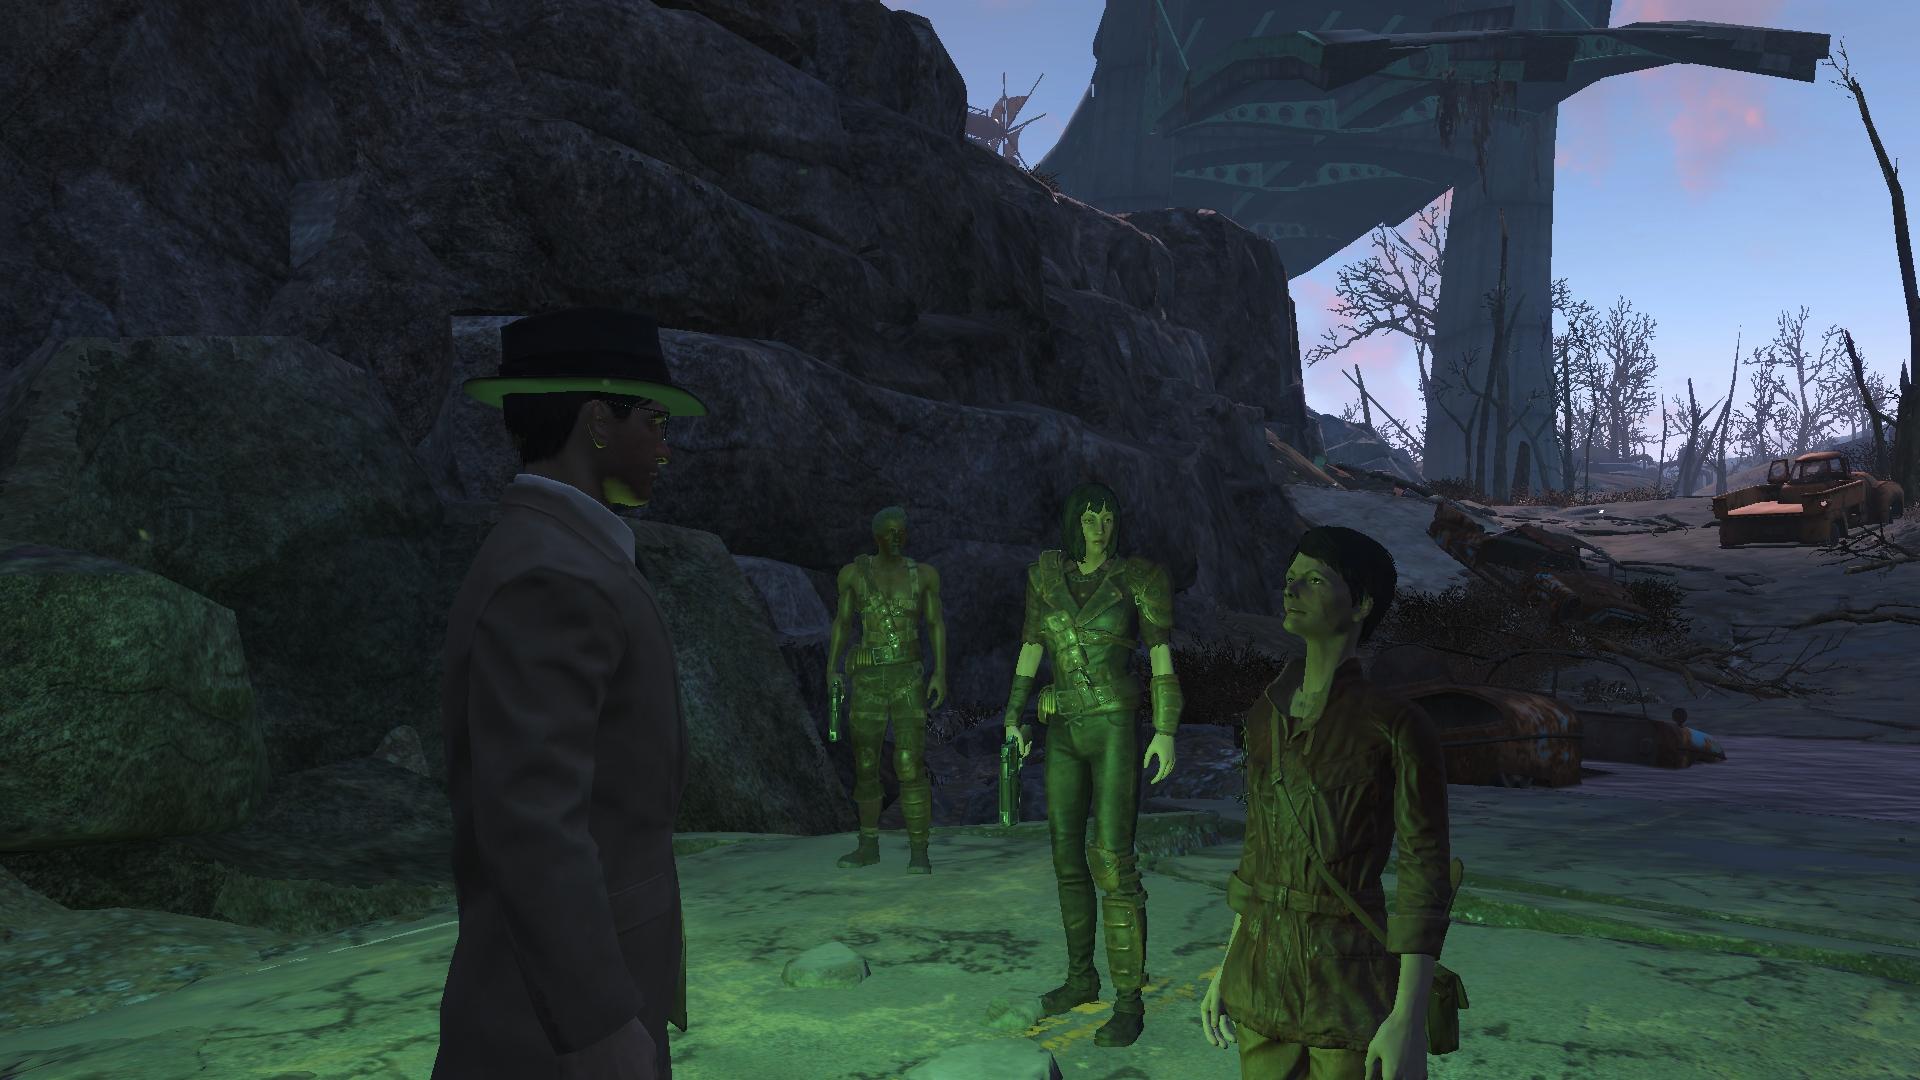 Fallout4_2017_01_07_17_56_58_058